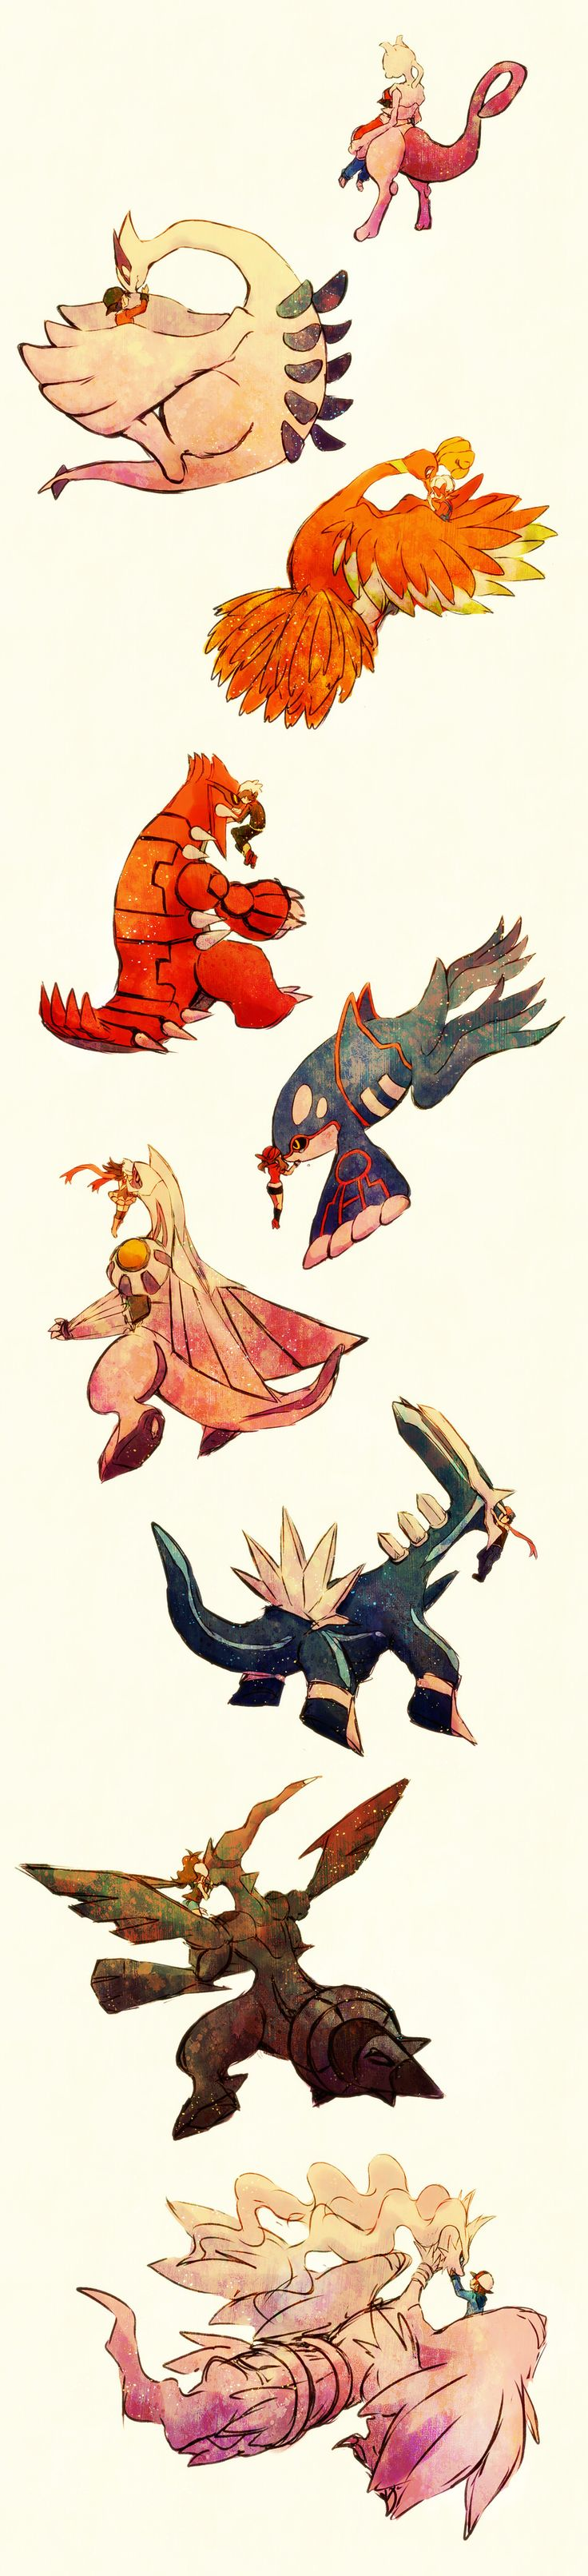 pokemon, mewtwo, lugia, ho-oh, groudon, kyogre, palkia, dialga, reshiram, zekrom